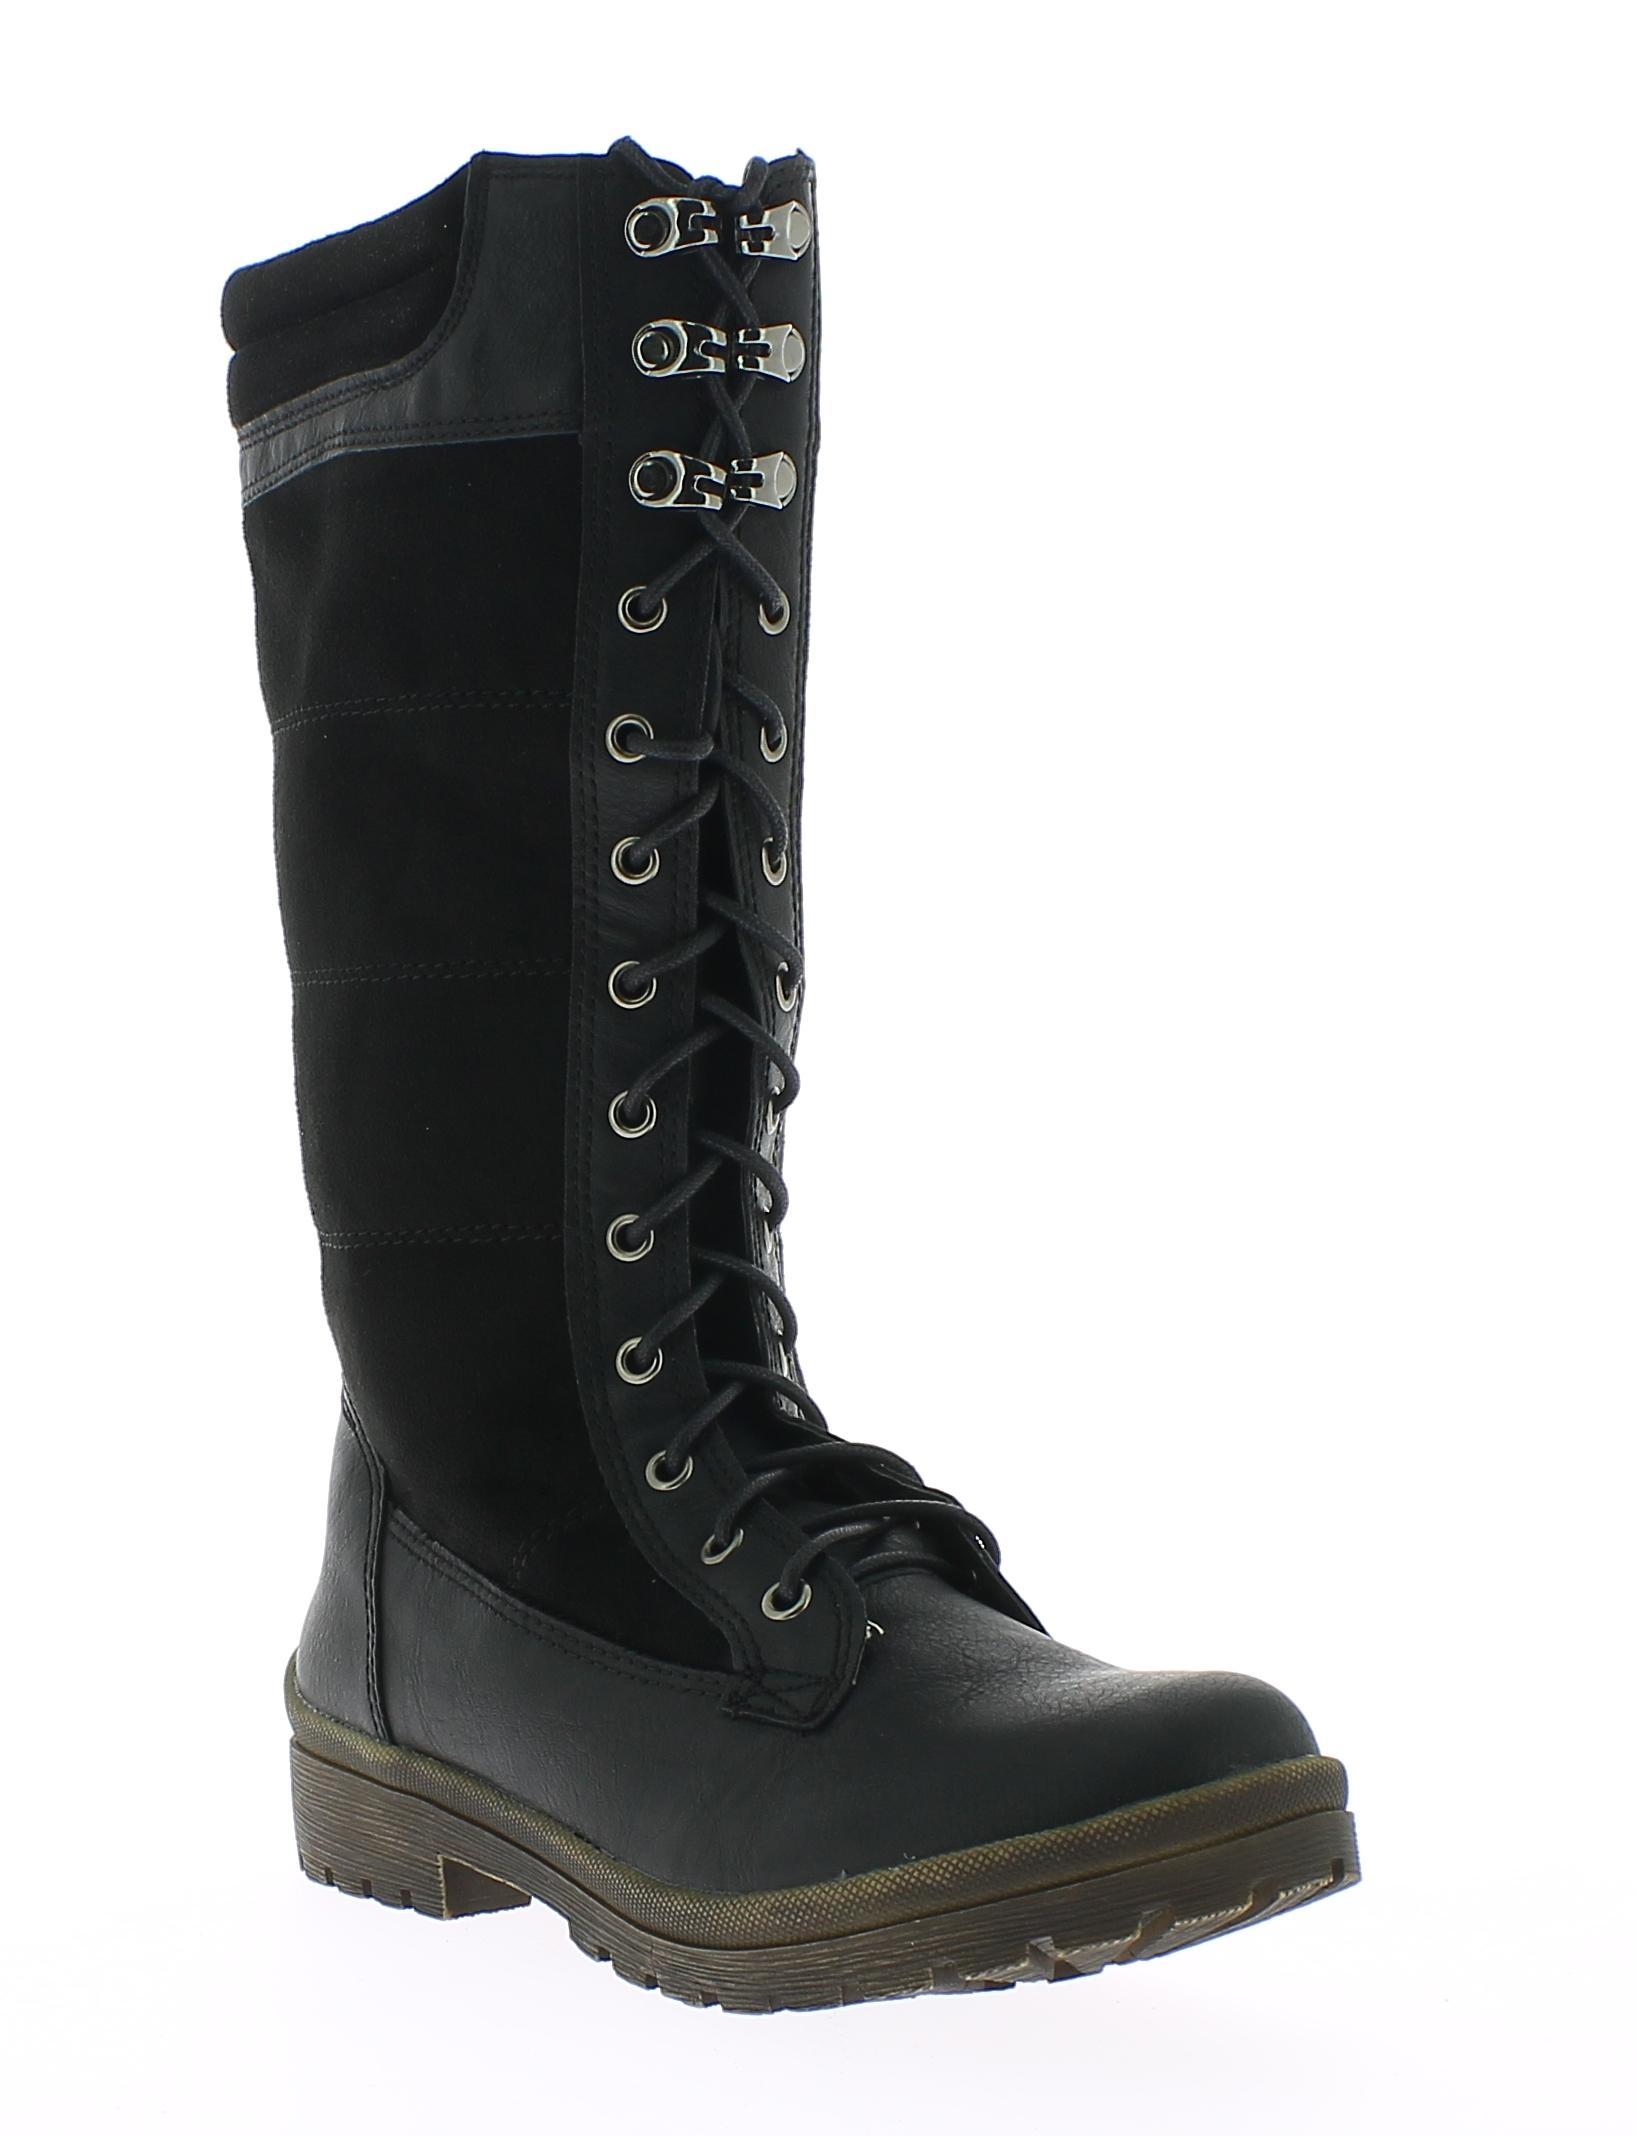 REFRESH Γυναικεία Μπότα 63073 Μαύρο - IqShoes - 63073 BLACK-black-39/1/15/25 παπούτσια  γυναικεία μποτάκια